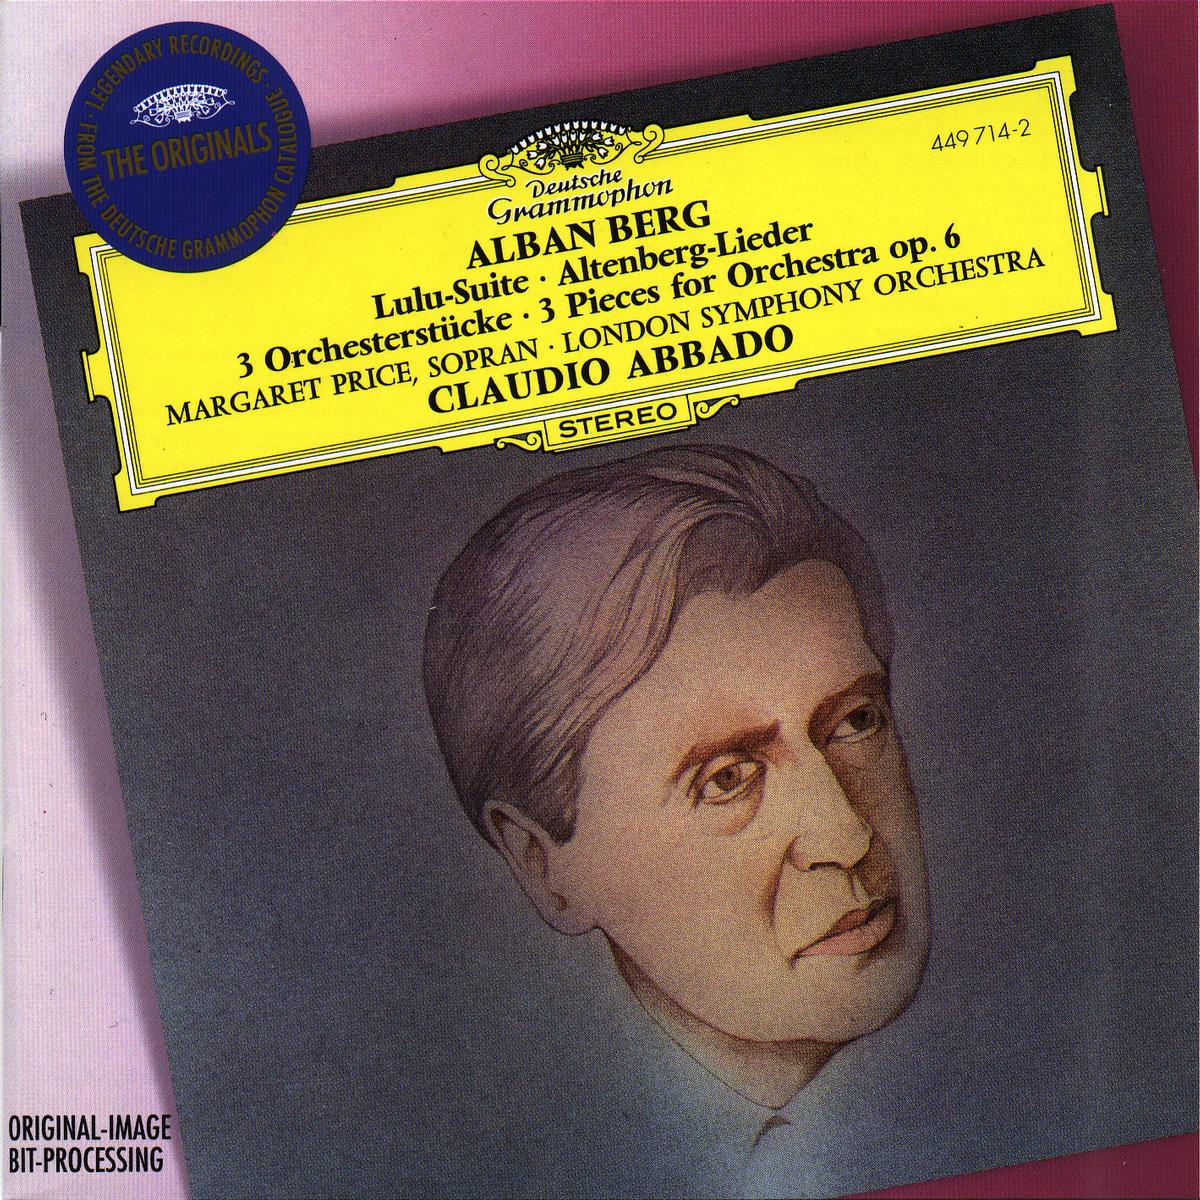 Playlist (148) - Page 2 Berg-lulu-suite-altenberg-lieder-3-pieces-for-orchestra-op6-0028944971422